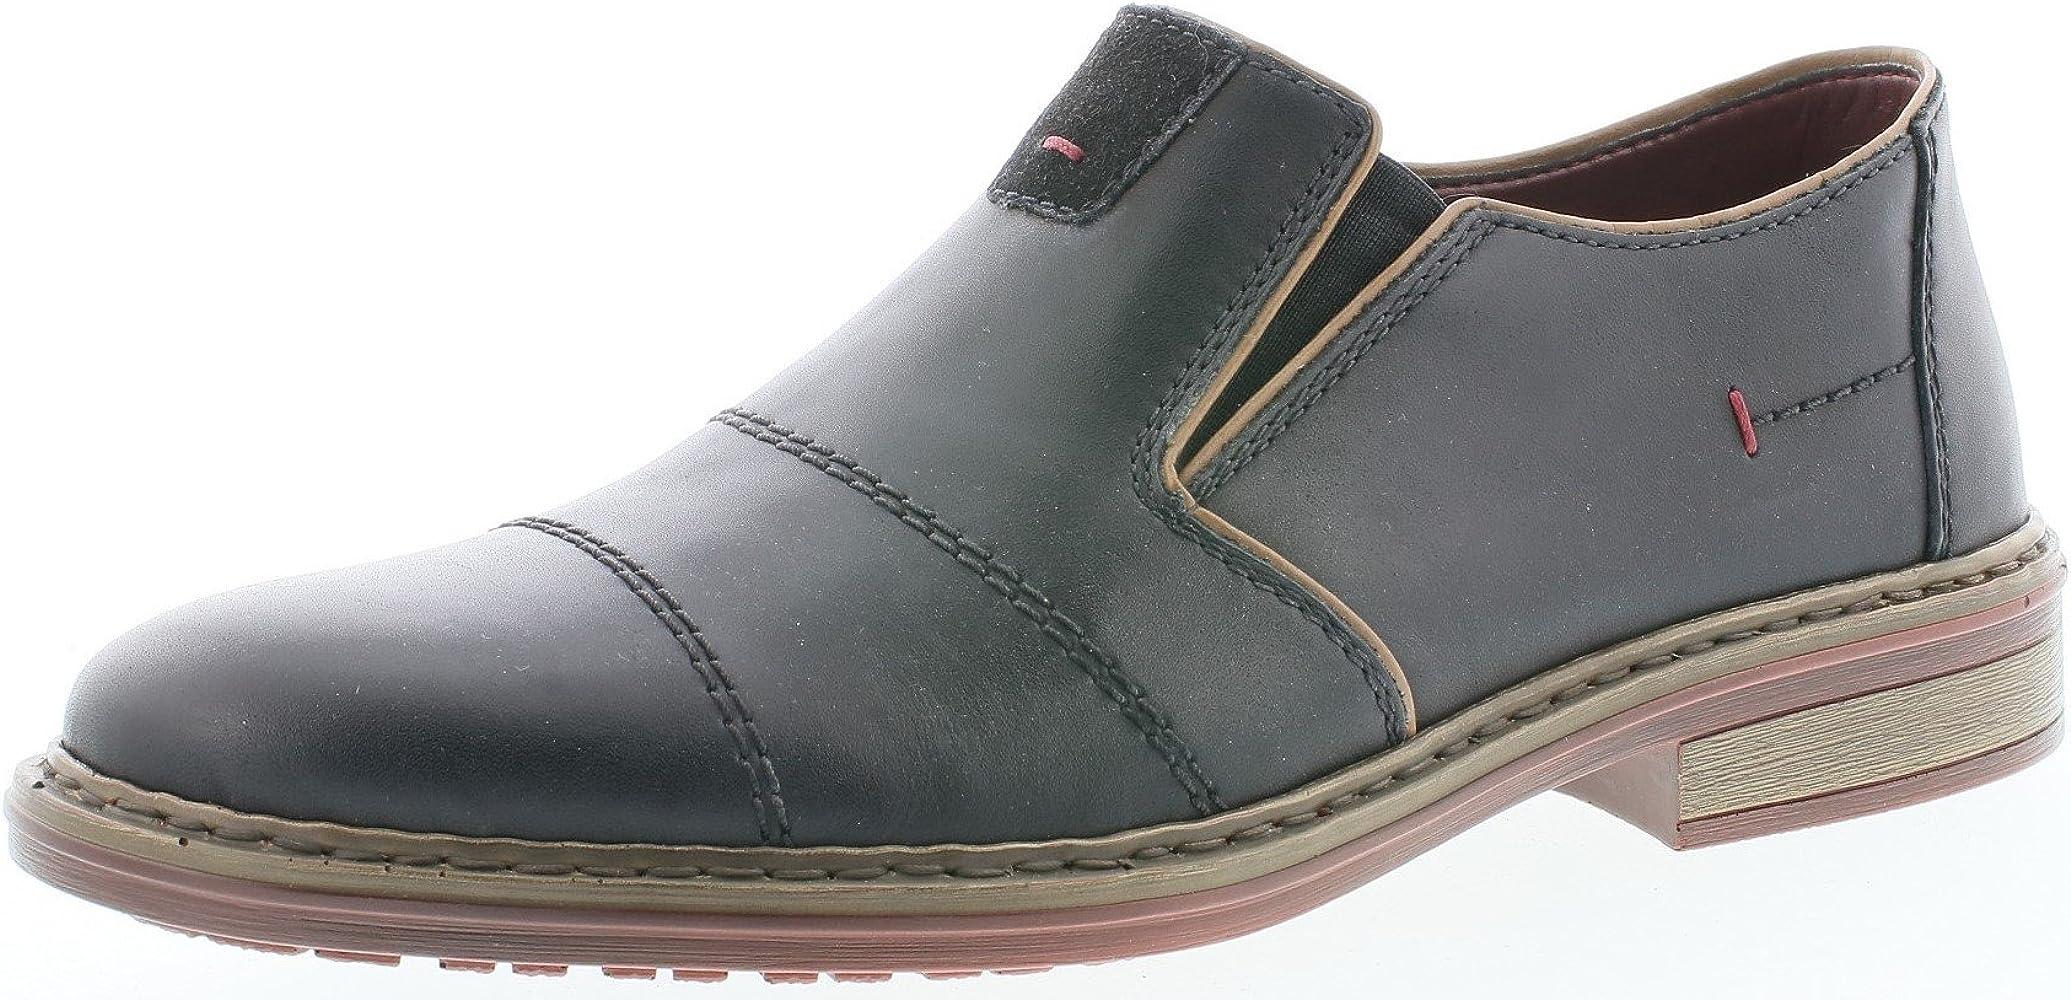 RIEKER ANTISTRESS HERREN Schuhe Slipper Halbschuh Mokassin